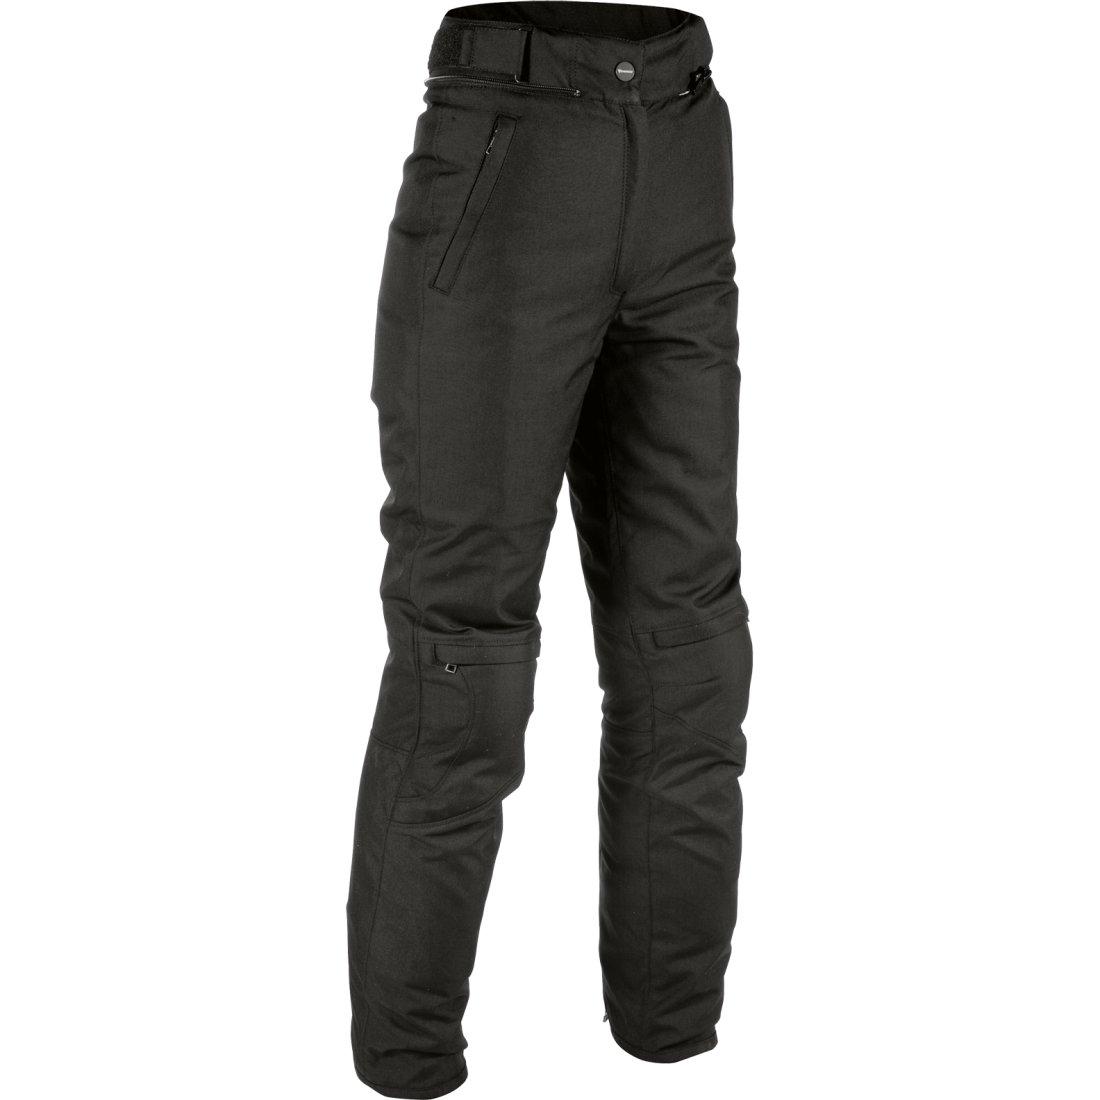 465593a122f 318 Pantalones para moto de carretera · Motocard